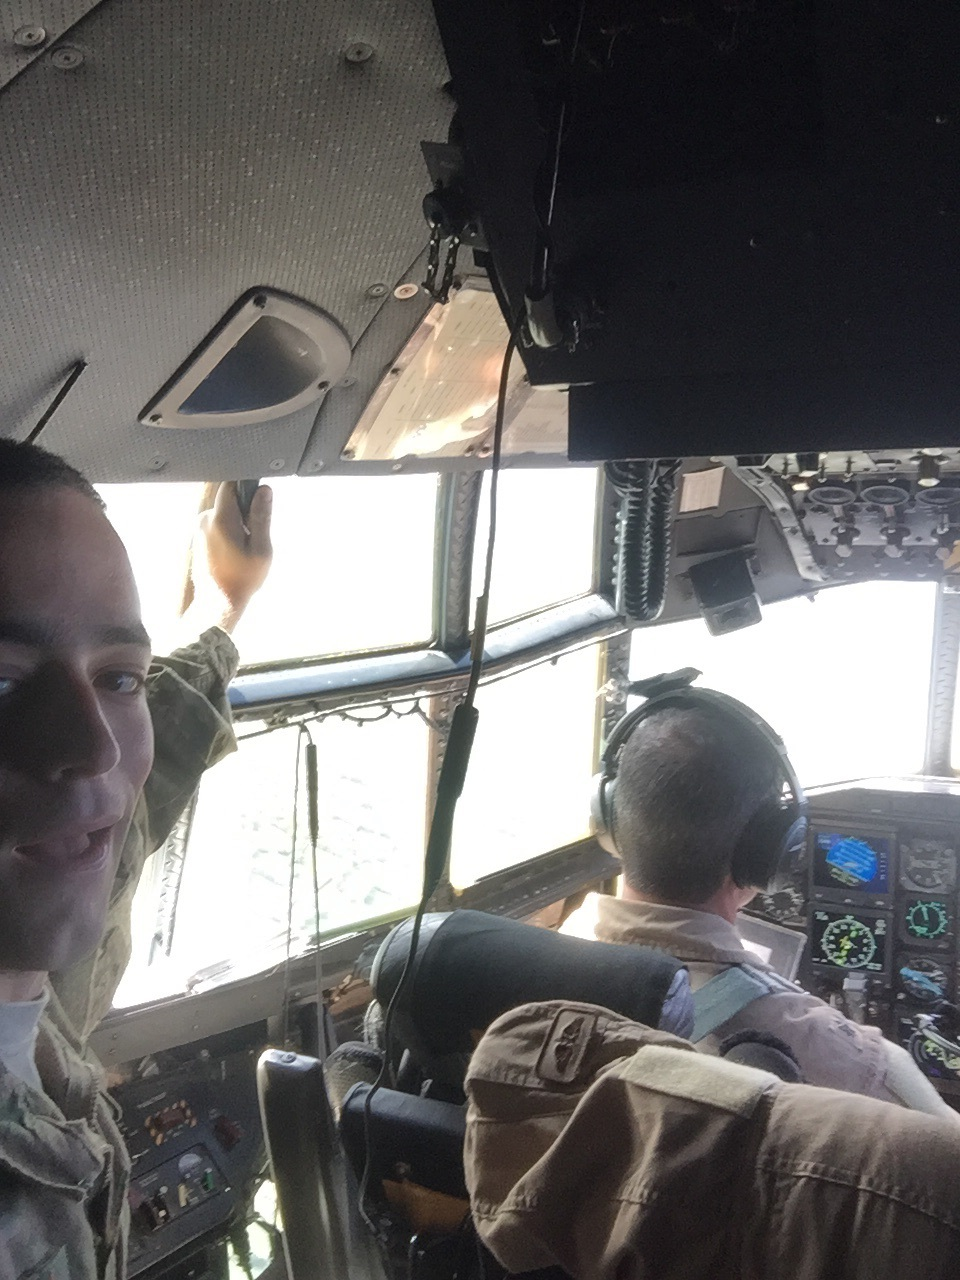 The obligatory cockpit selfie.